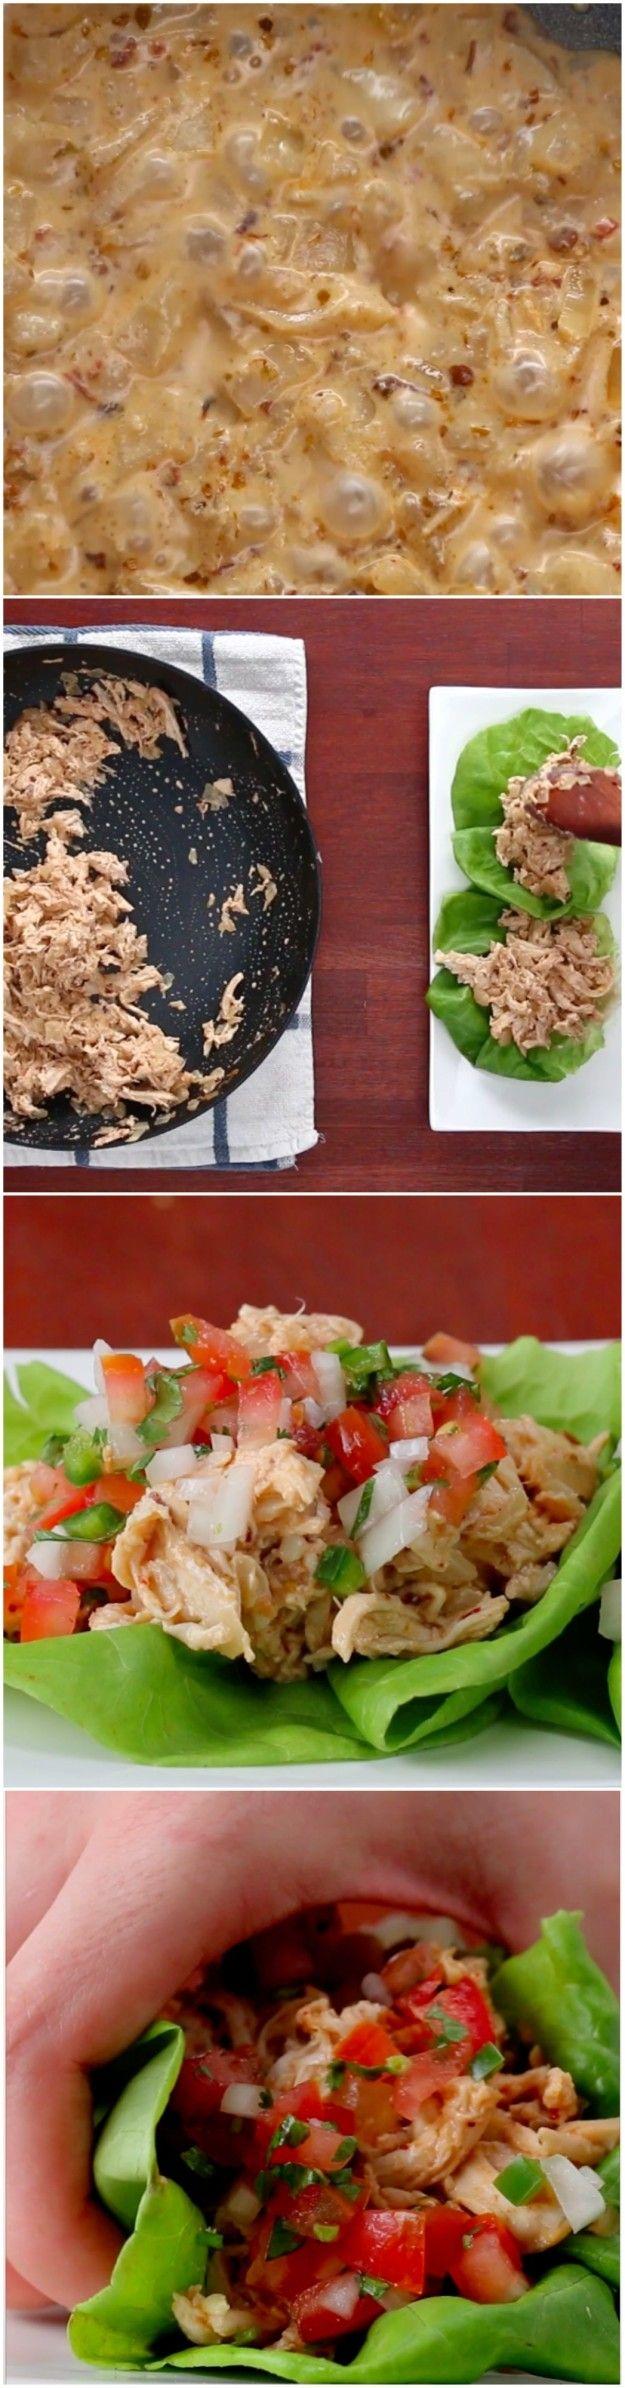 Cremige Chipotle Huhn Salat Tacos | Schnappen One Of These Creamy Chipotle Huhn Salat Tacos für das Mittagessen